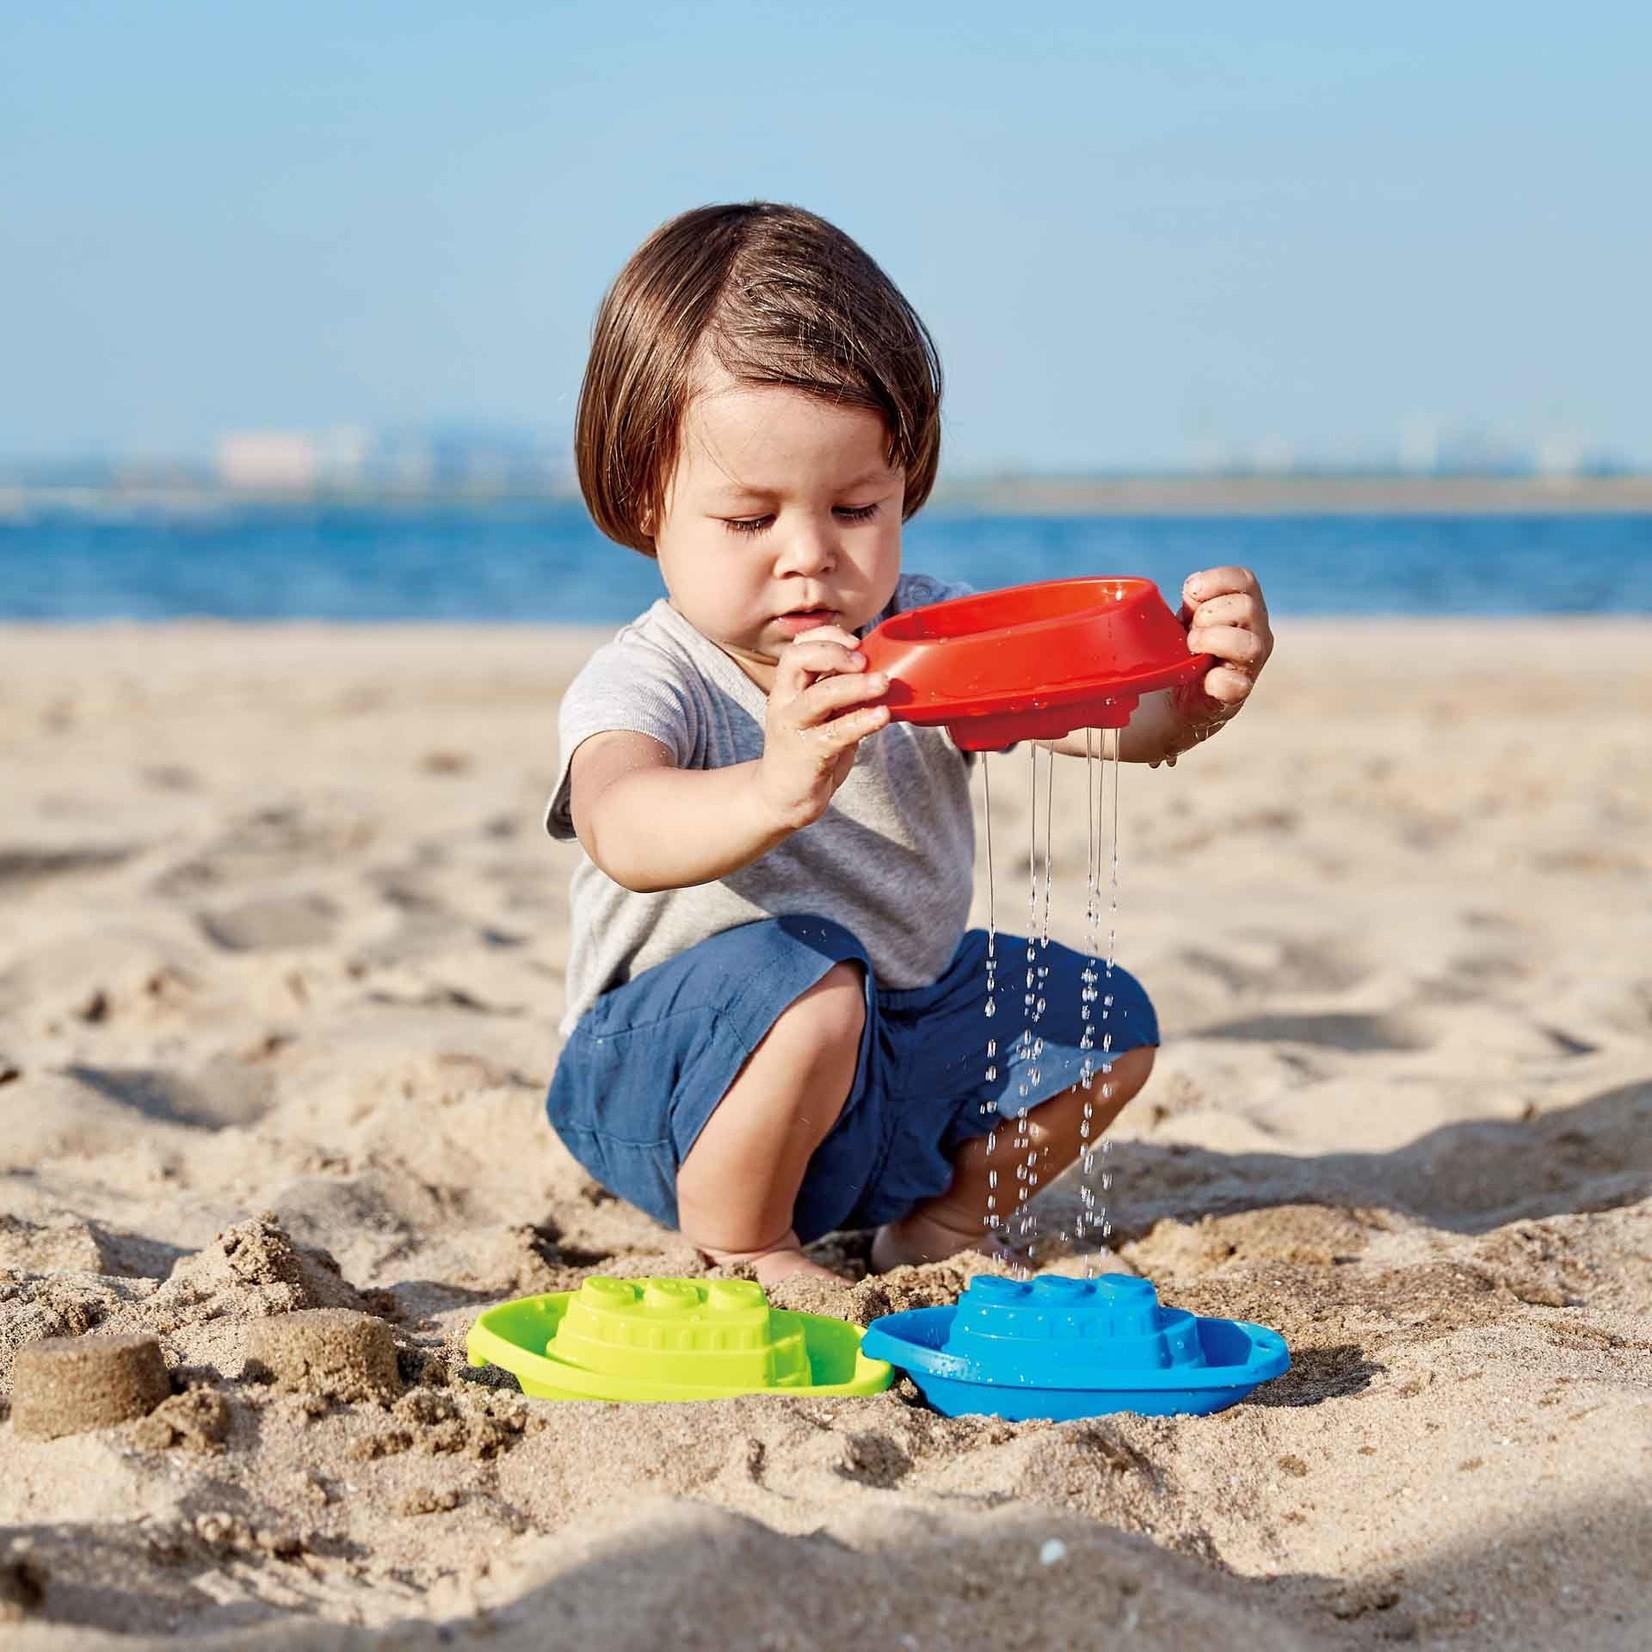 HAPE BEACH AND BATH BOATS